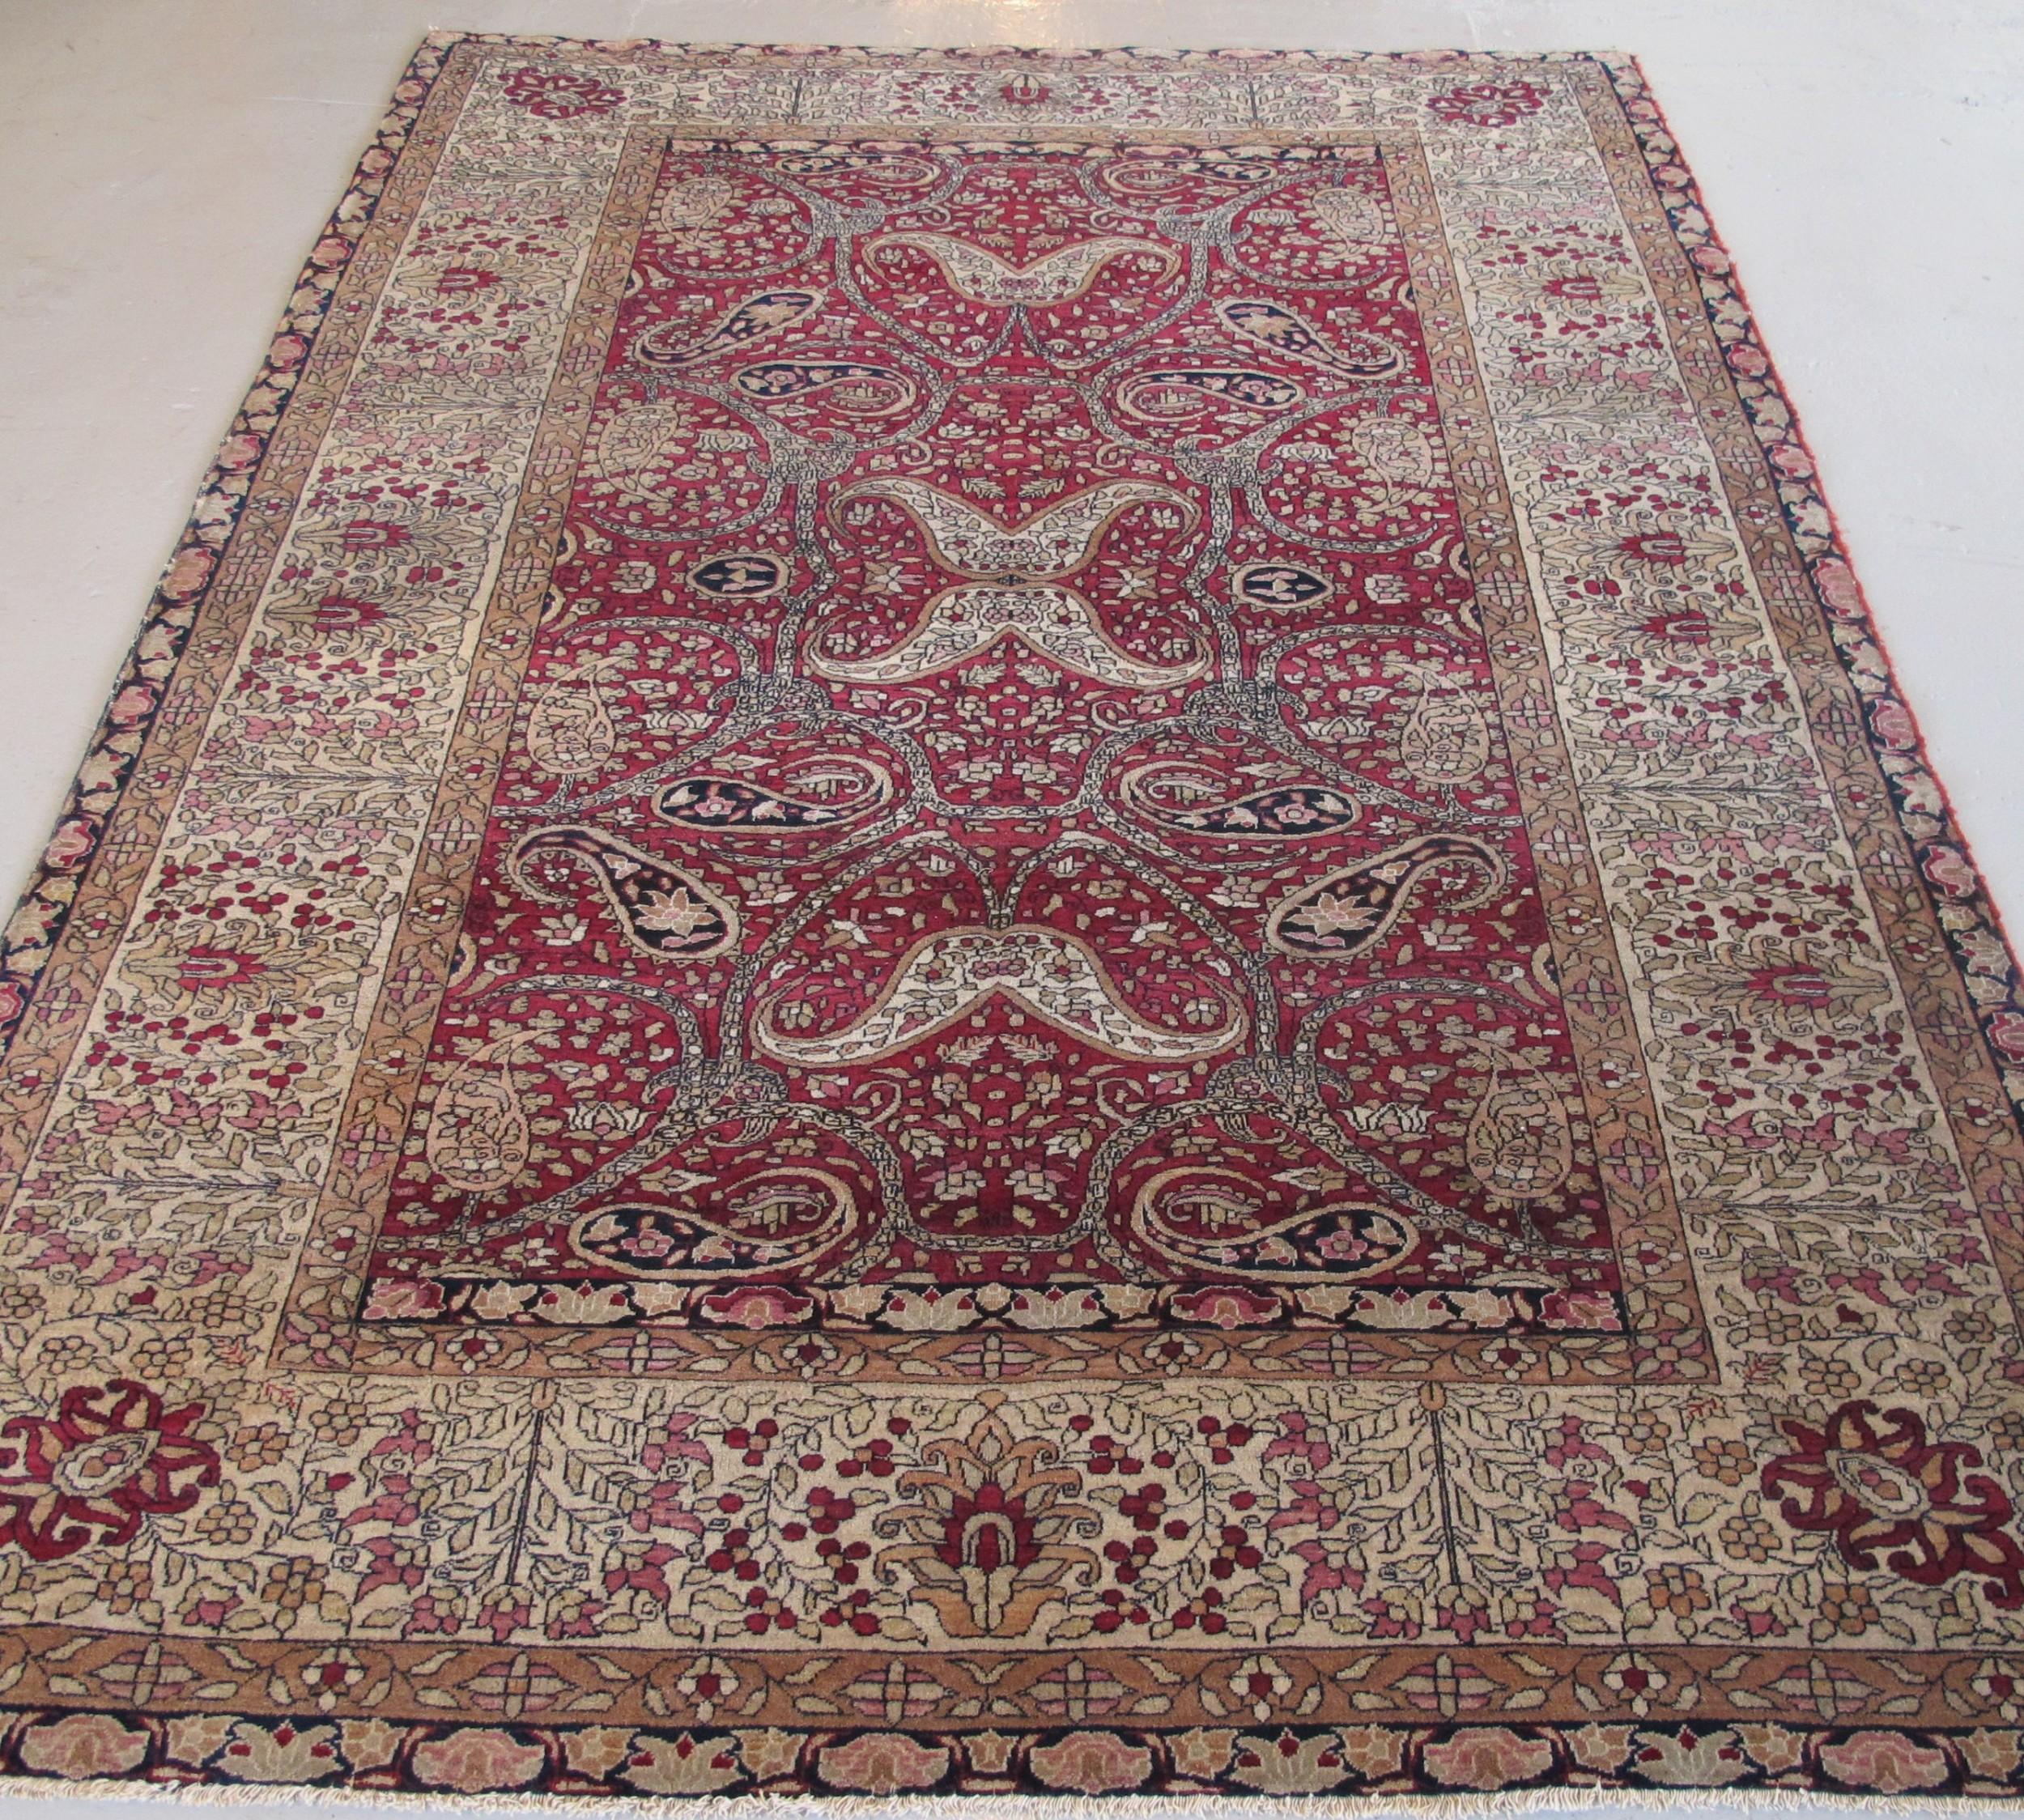 fine isfahan rug central persia circa 1910 232m x 150m 7'8 x 4'11